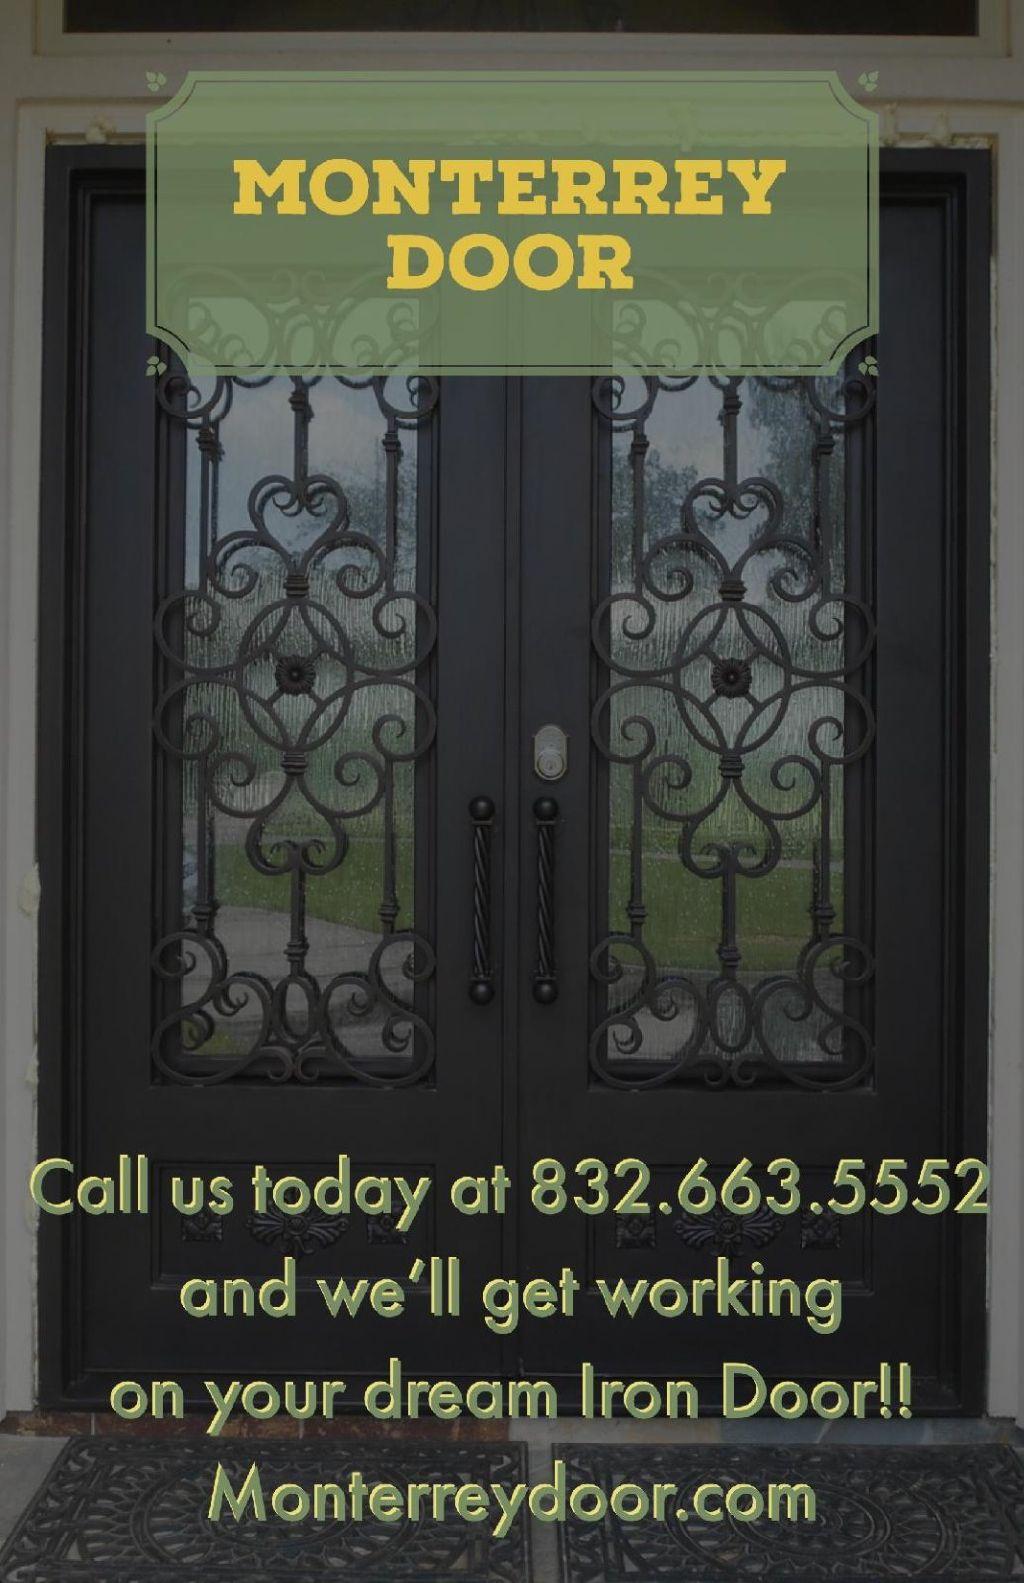 Need ... & Iron DoorsDouble or Single - Claz.org